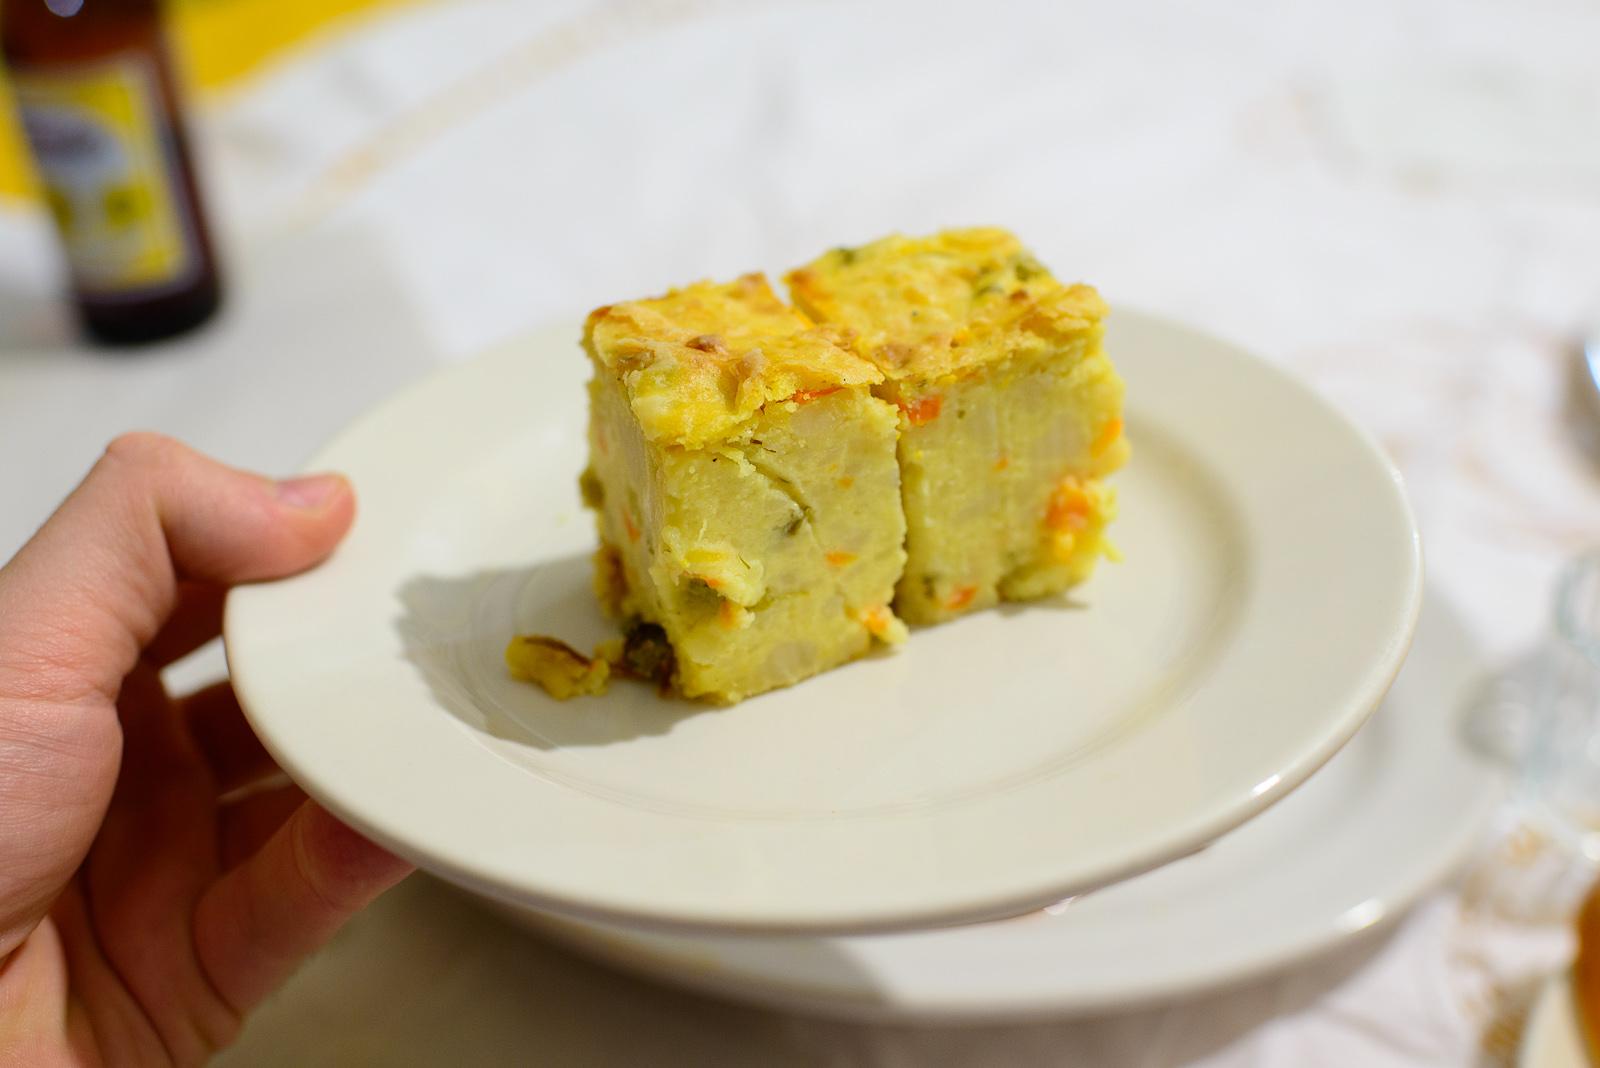 """Purée de papa, estilo Istmeño"" - Potato cakes"